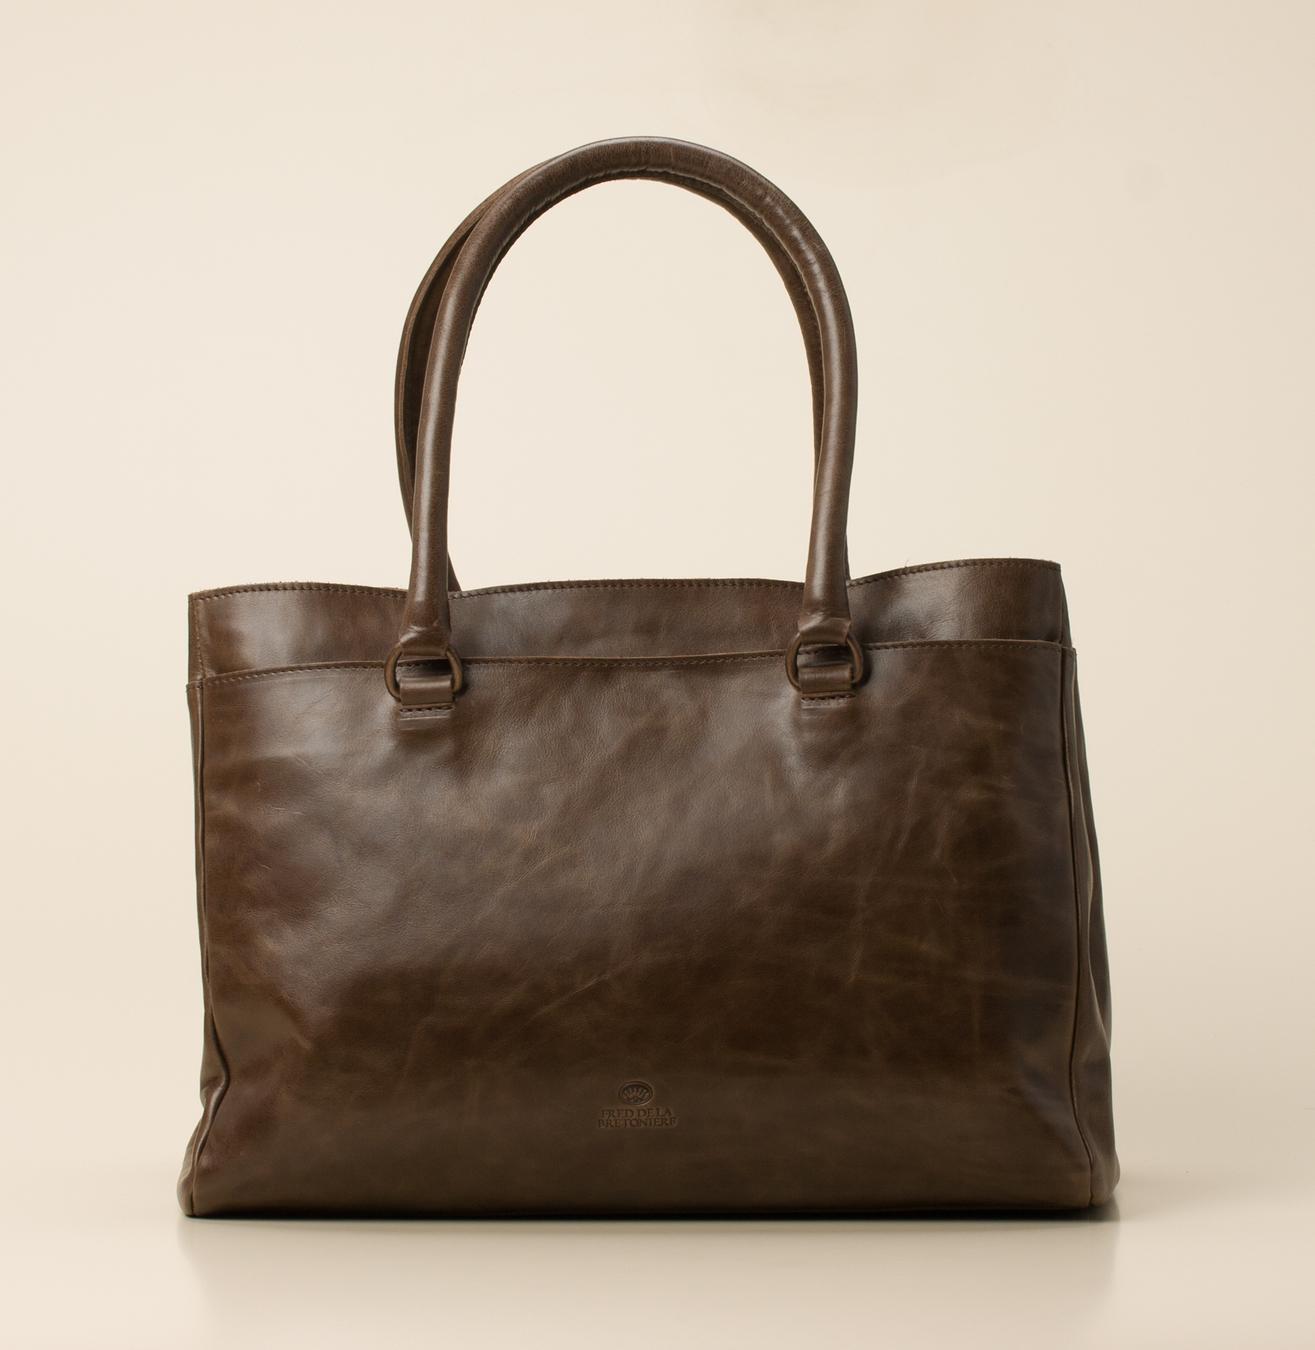 93ec3c8564662 Fred de la Bretoniere Damen-Acces. Handtasche in taupe kaufen ...